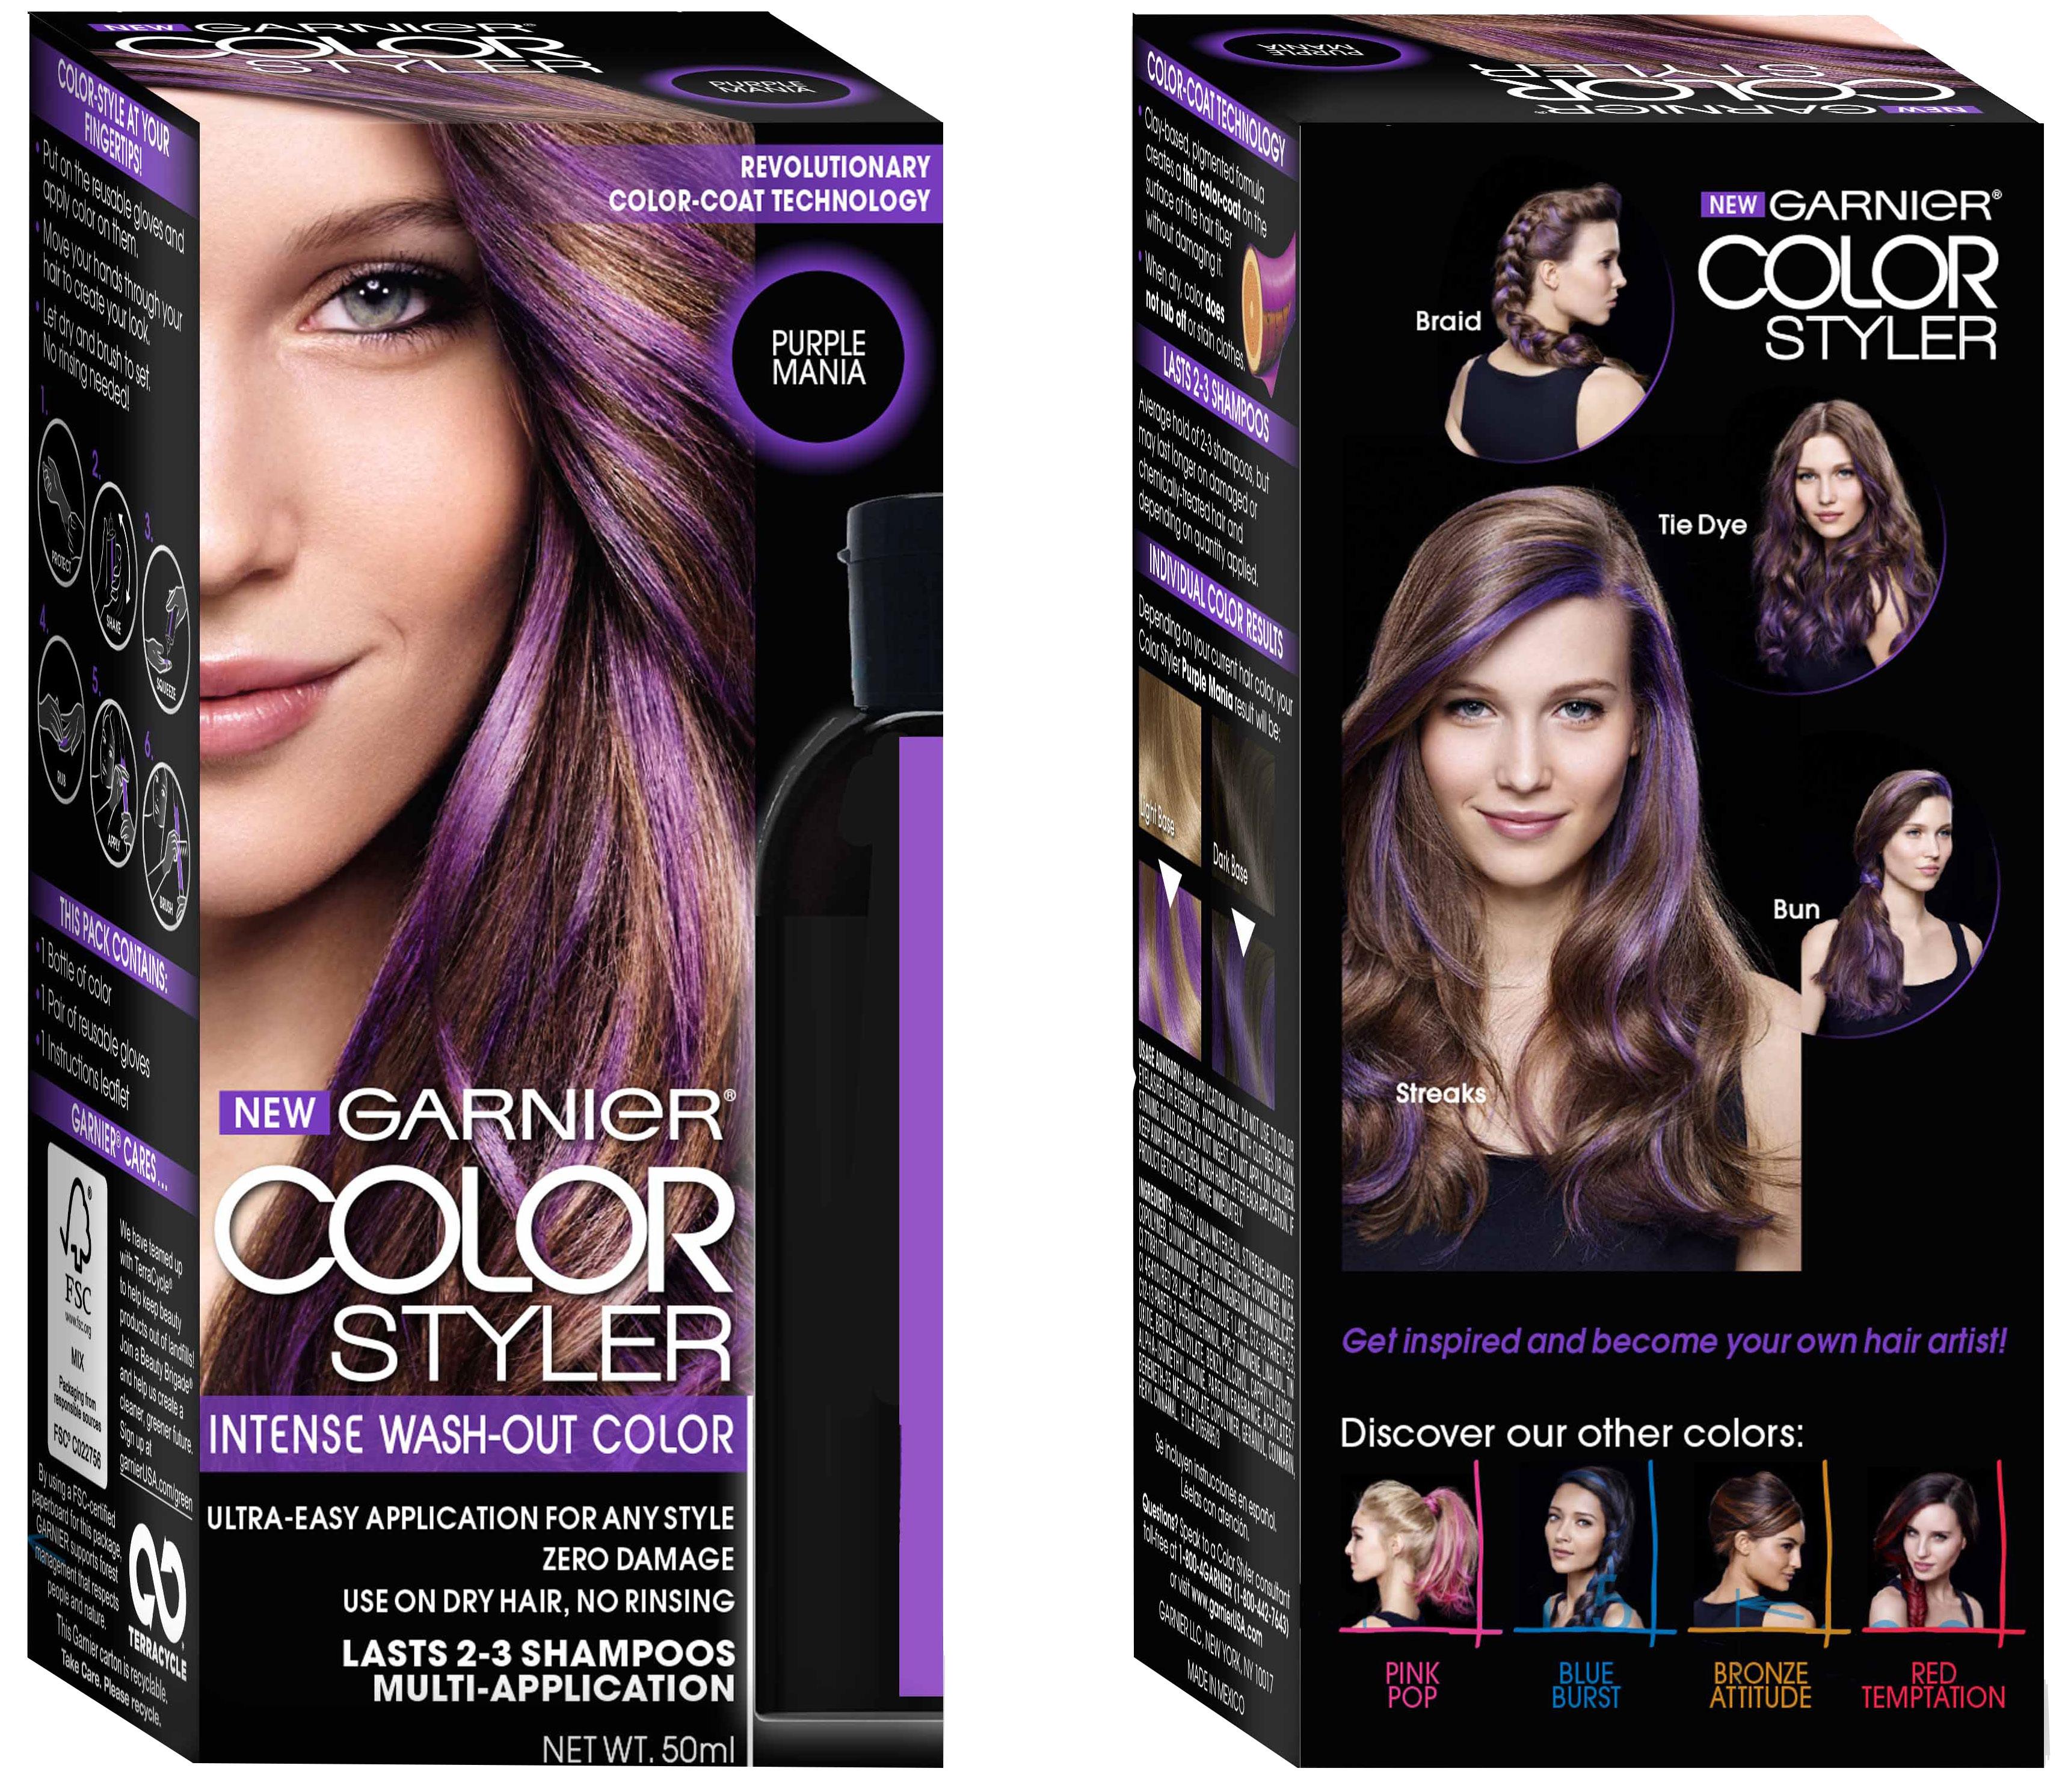 Garnier Color Styler Intense Wash Out Color London Drugs